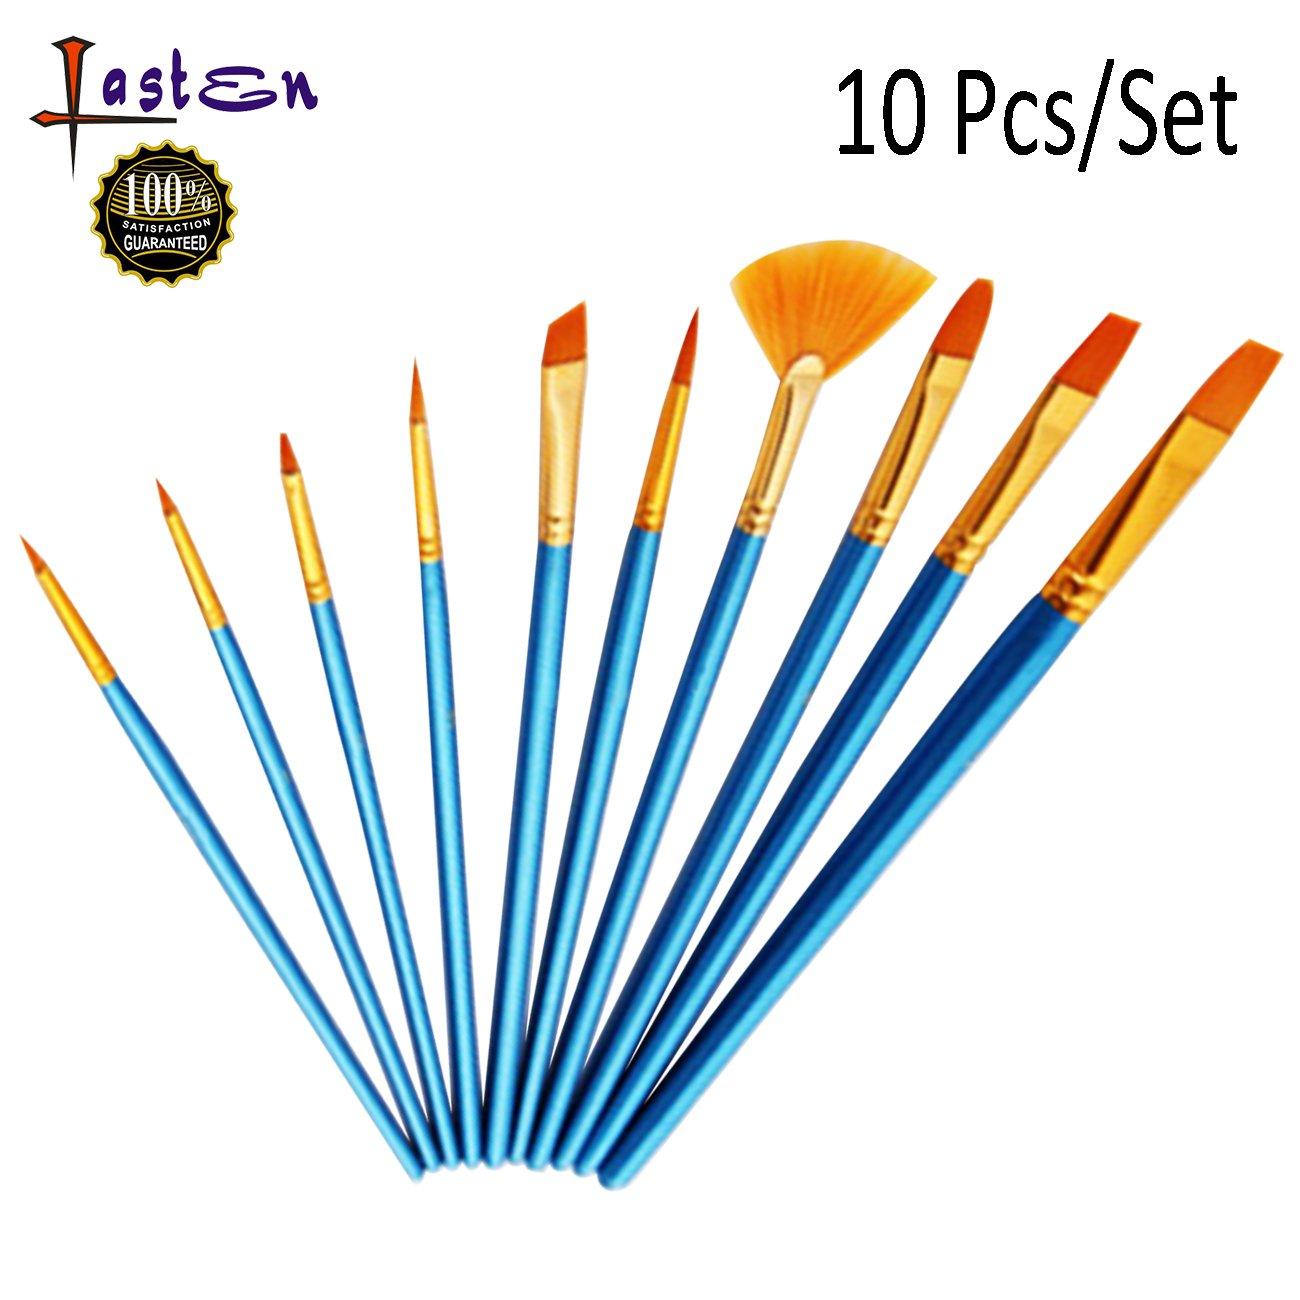 Lasten Paint Brush Set, Professional Paint Brushes Nylon Hair Artist Acrylic Brush for Watercolor Oil Acrylic Gouache Painting(10 pcs/set)